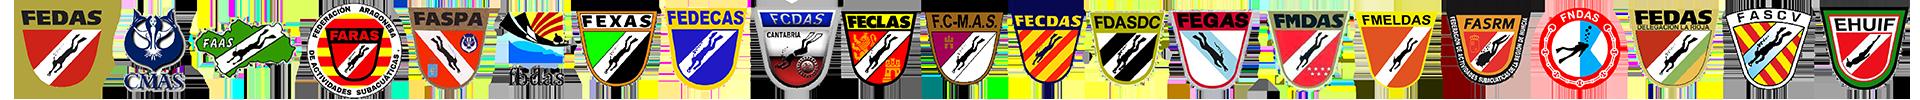 fedastv banner